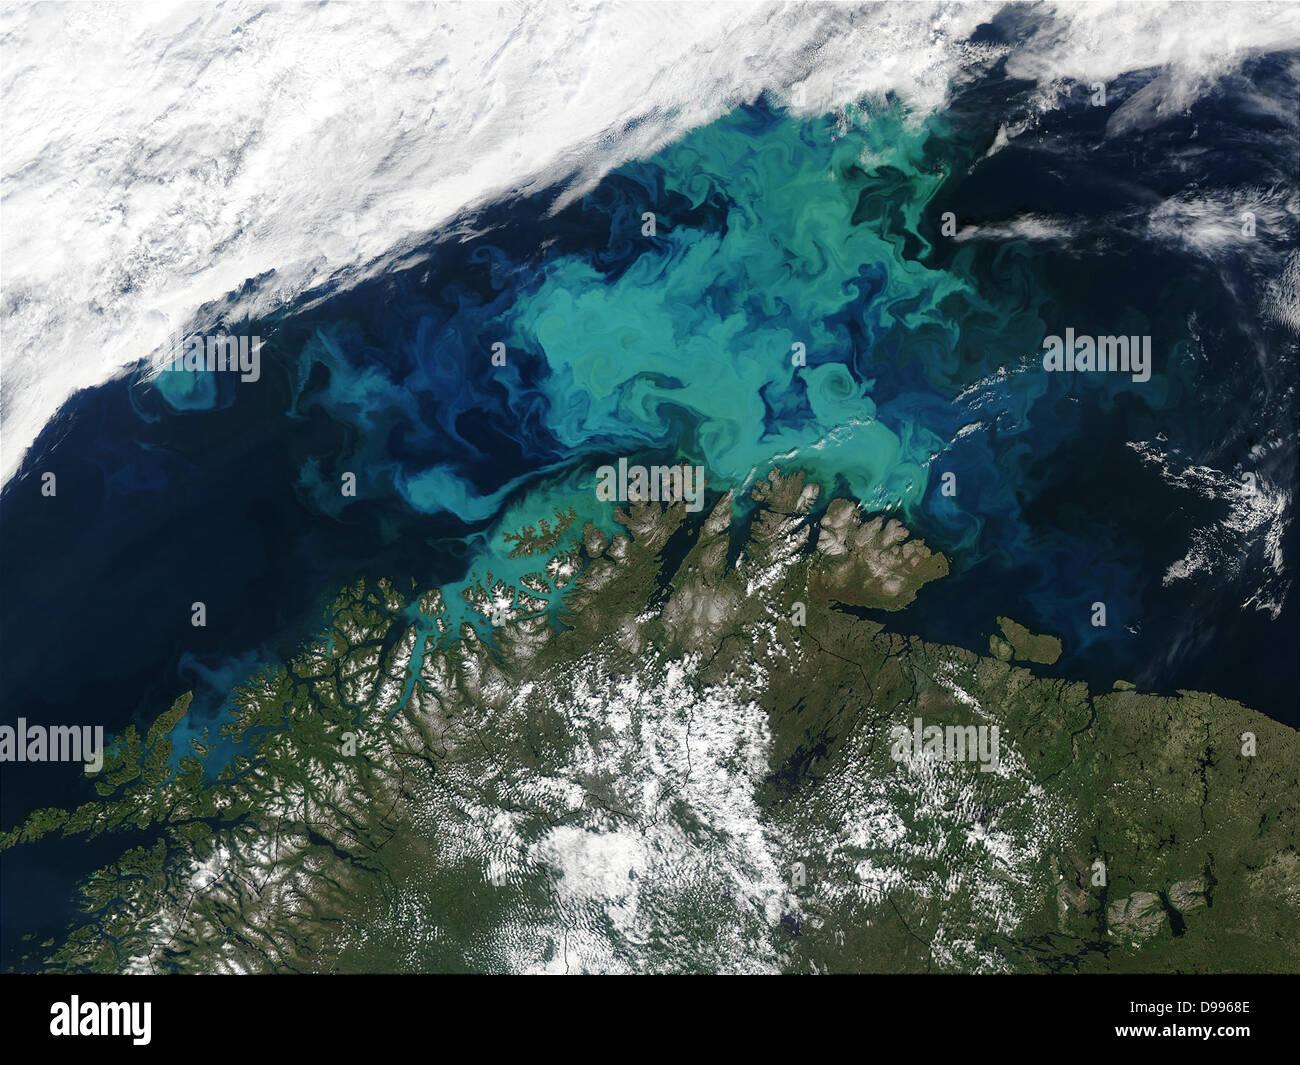 Mar de Barents Julio 19th, 2003, como se ha visto por el MODIS. Imagen cortesía de Jacques Descloitres, MODIS Imagen De Stock